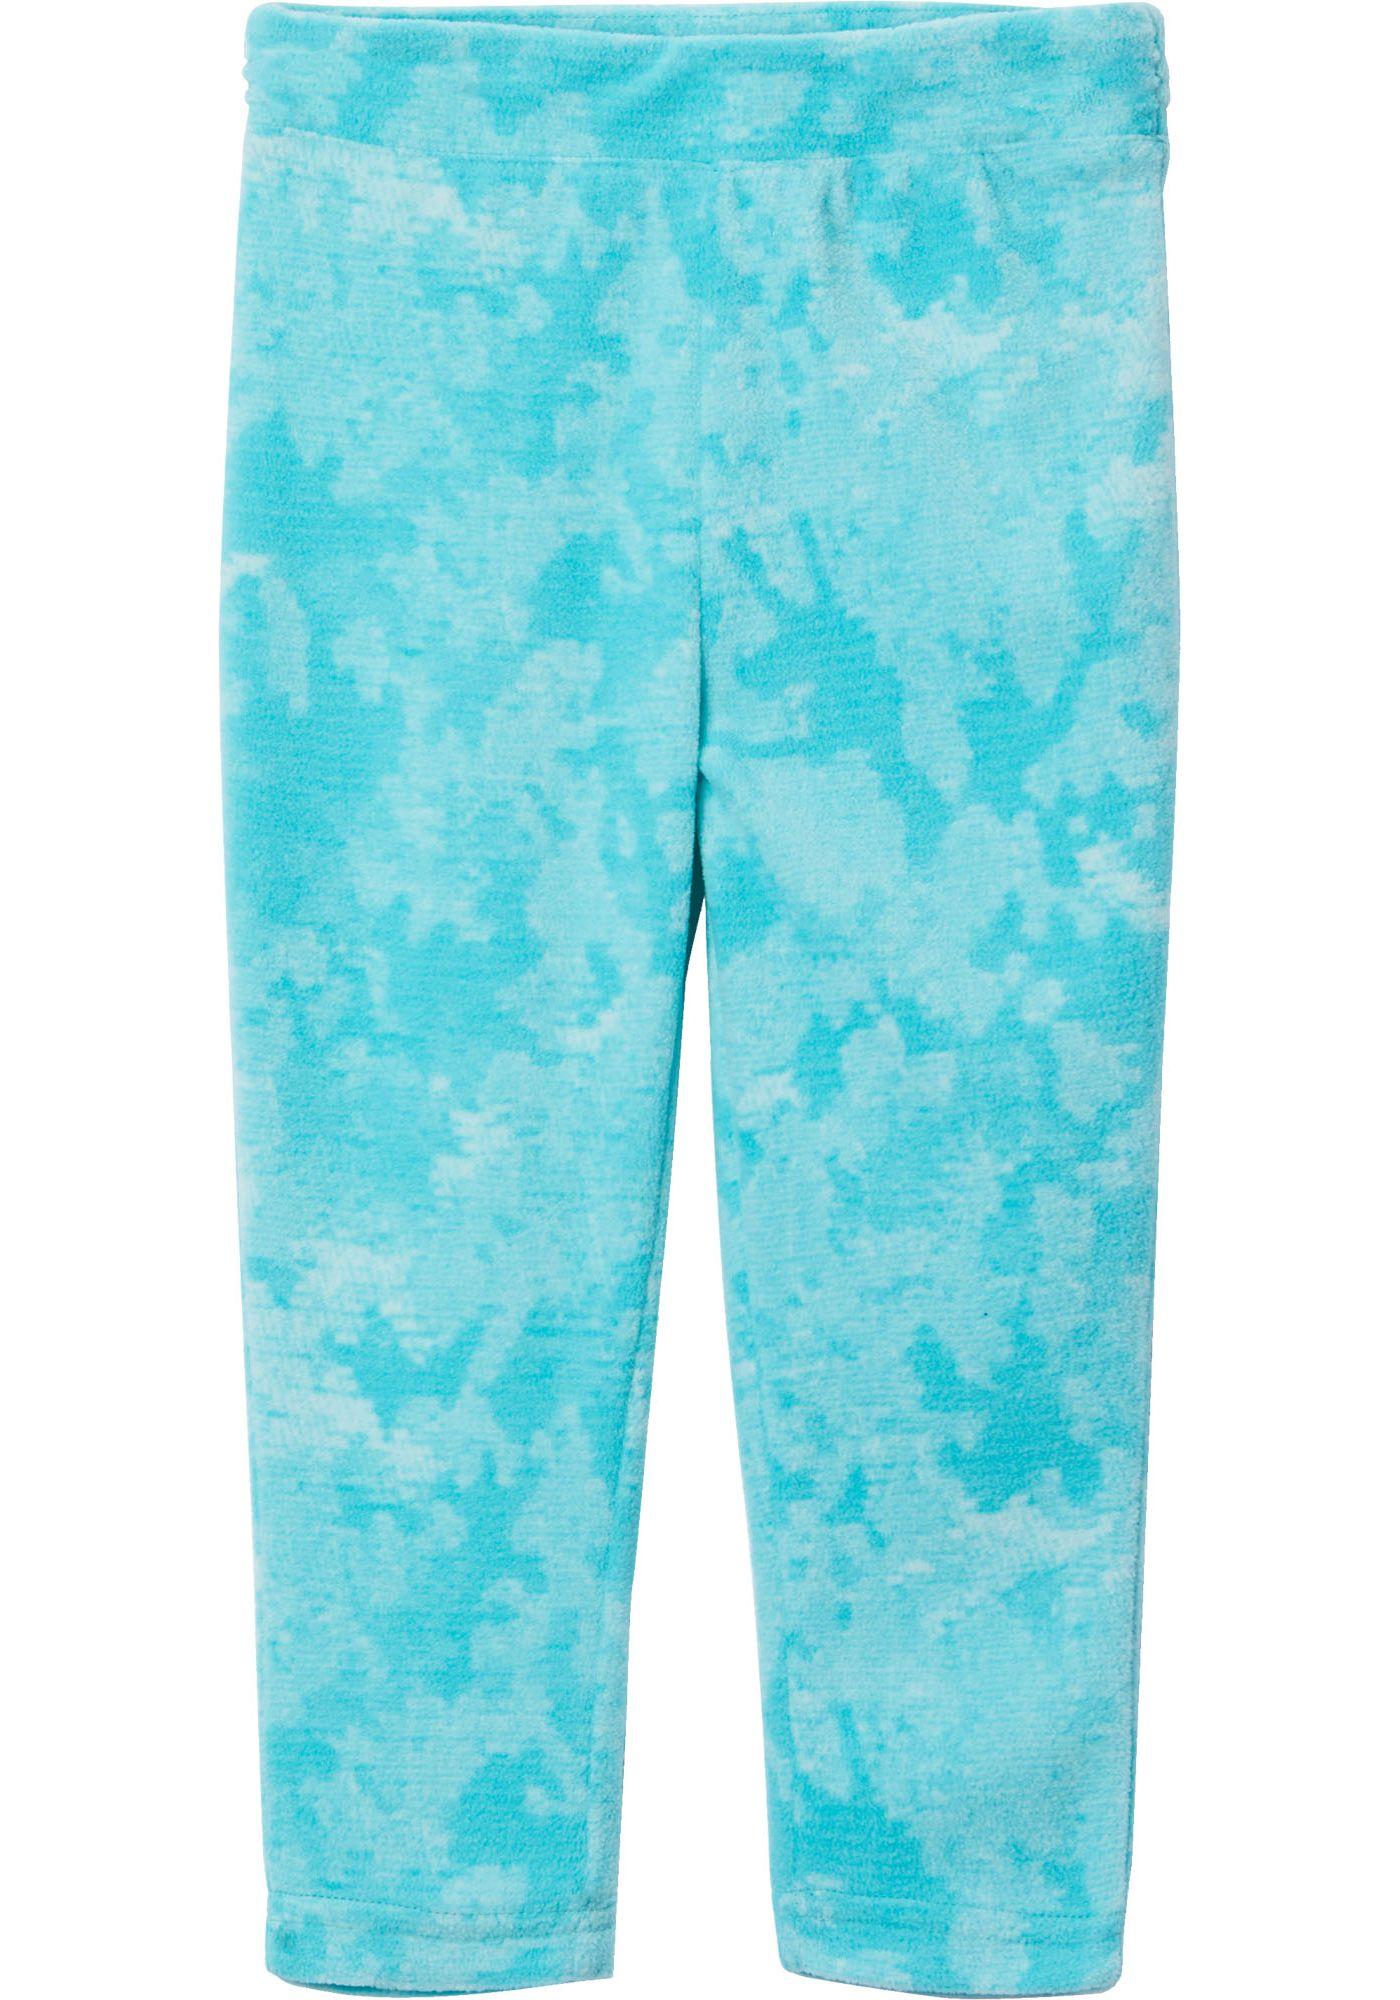 Columbia Girls' Glacial Printed Fleece Leggings